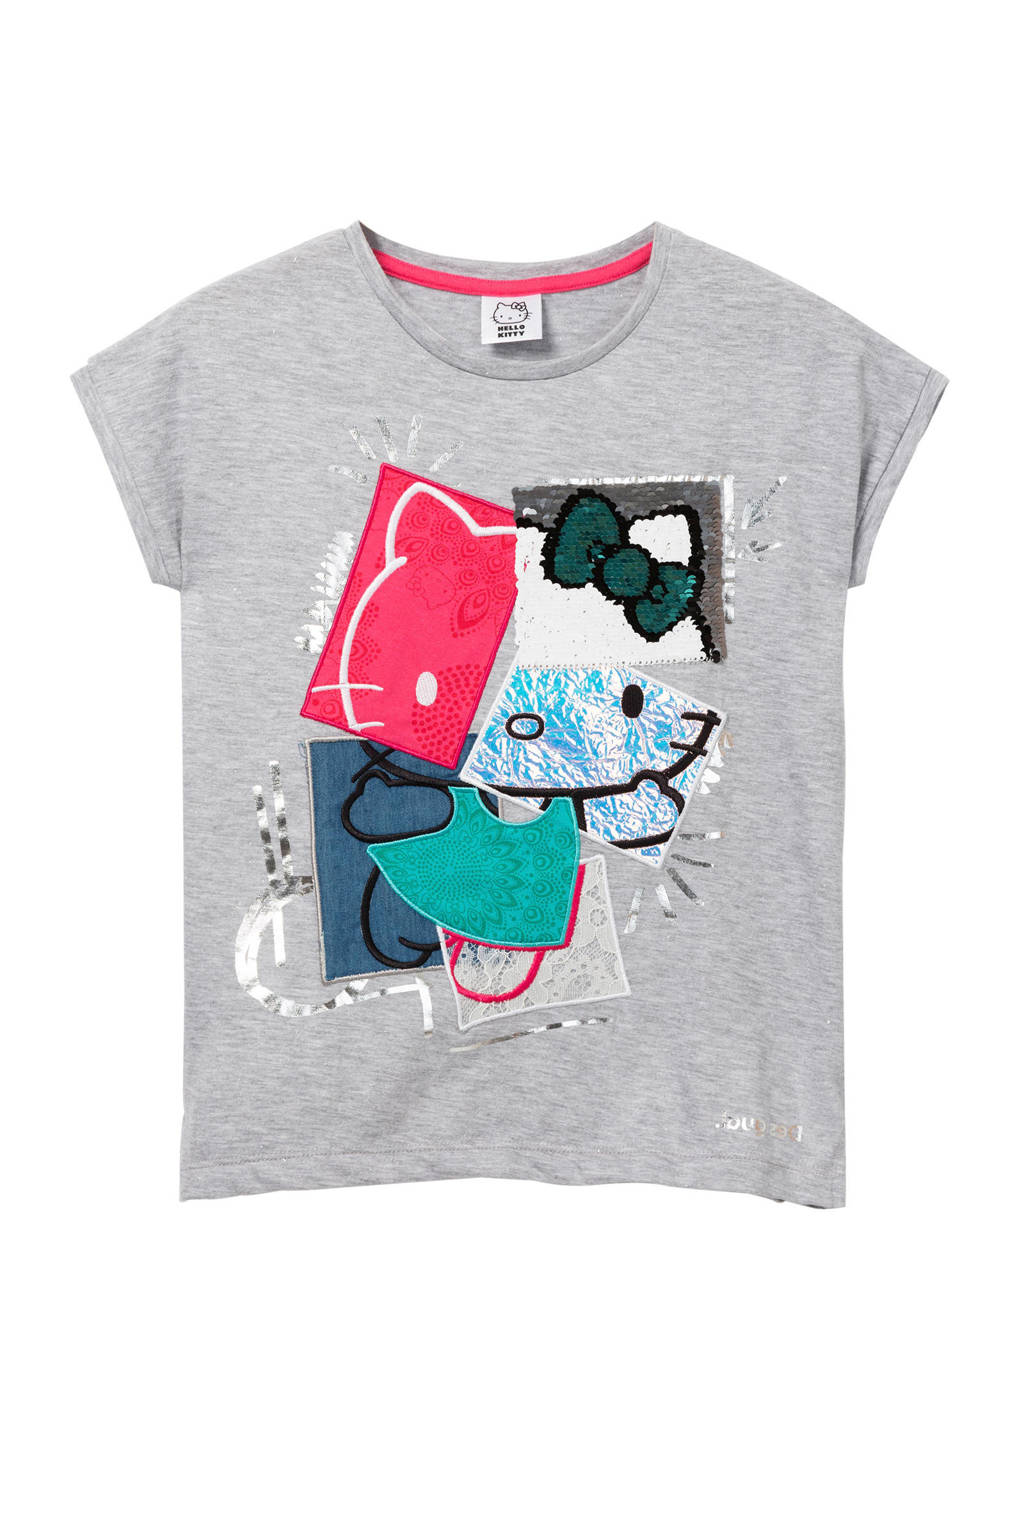 Desigual Hello Kitty T-shirt met printopdruk en pailletten lichtgrijs melange, Lichtgrijs melange/roze/blauw